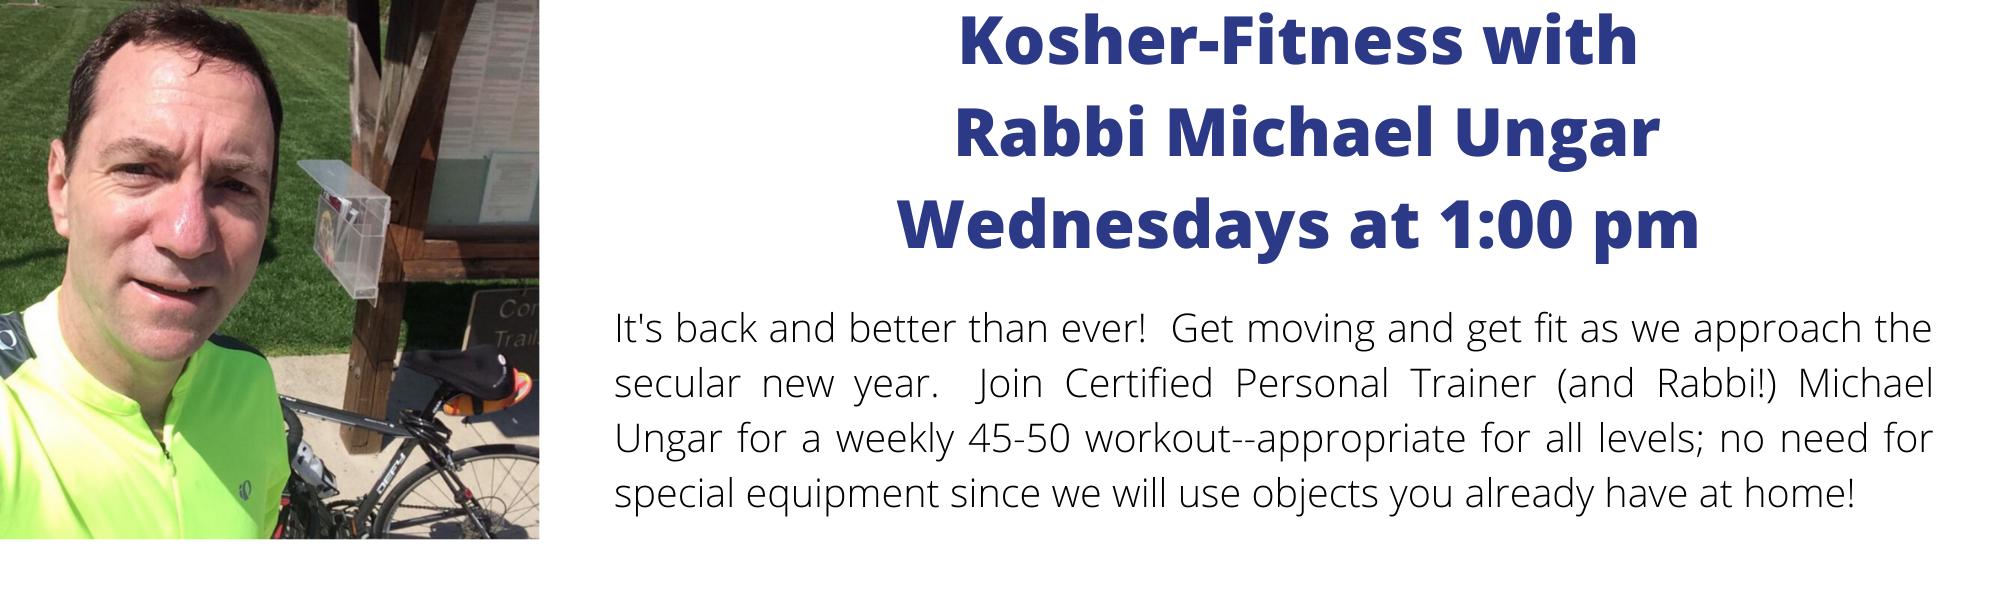 Banner Image for Kosher-Fitness with Rabbi Michael Ungar